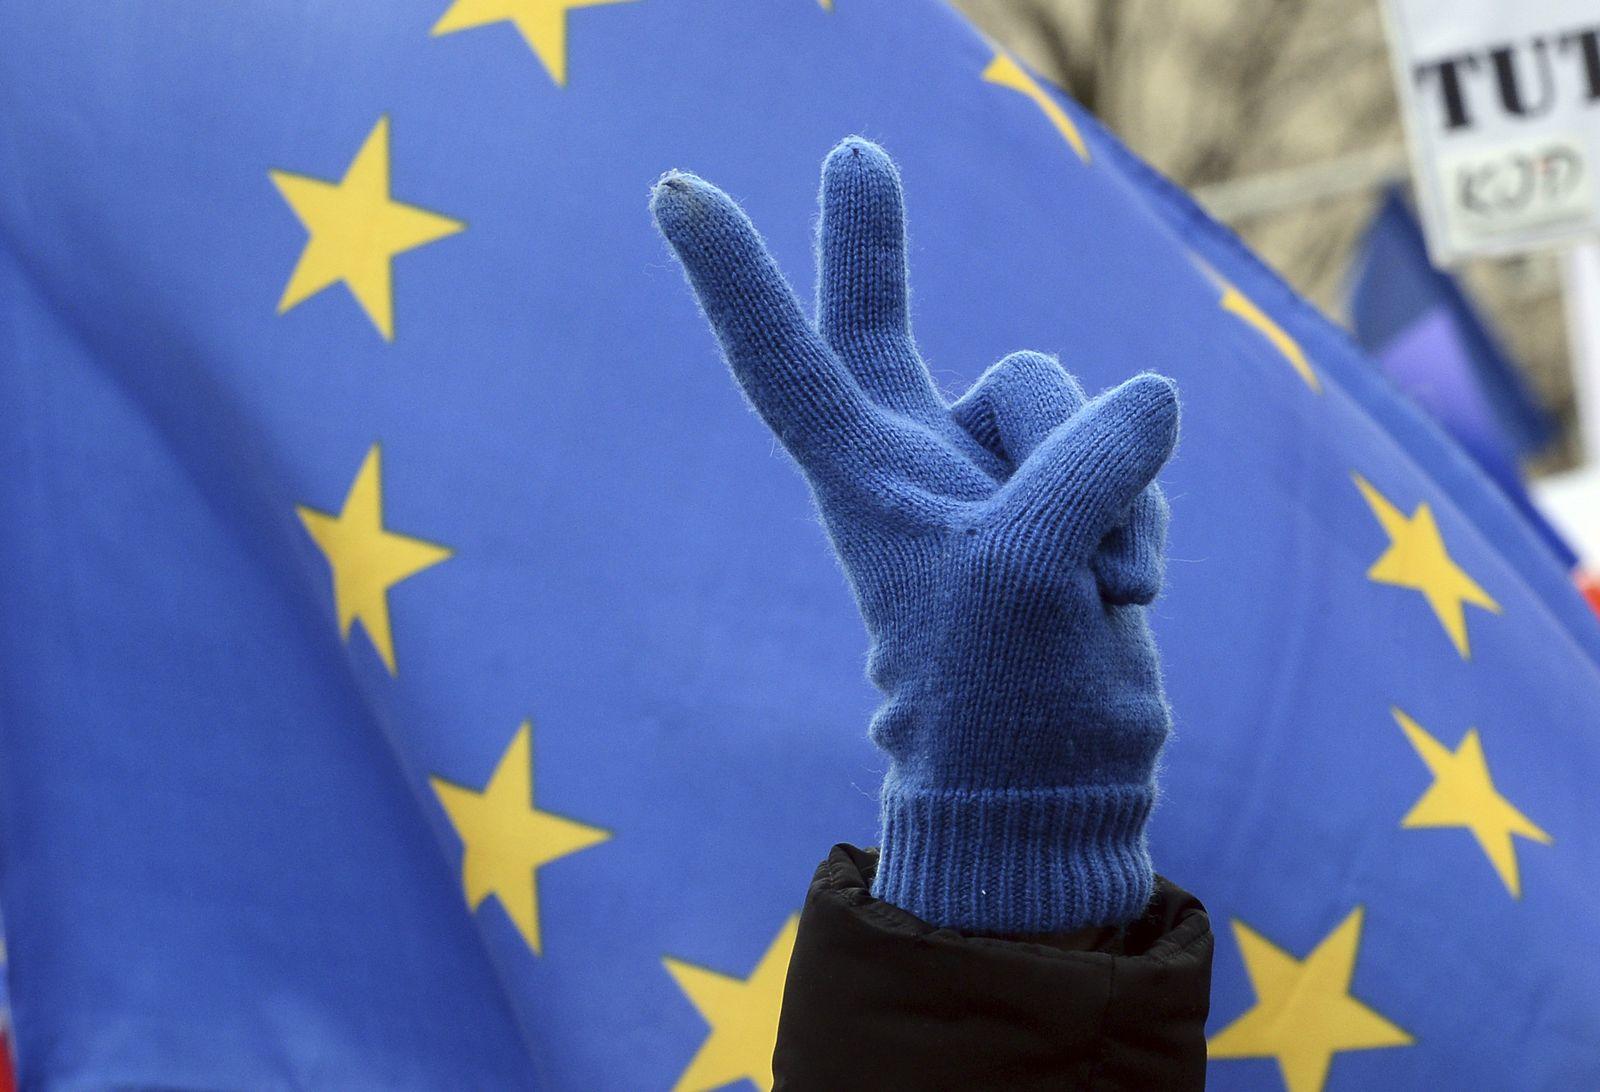 europa peace-zeichen